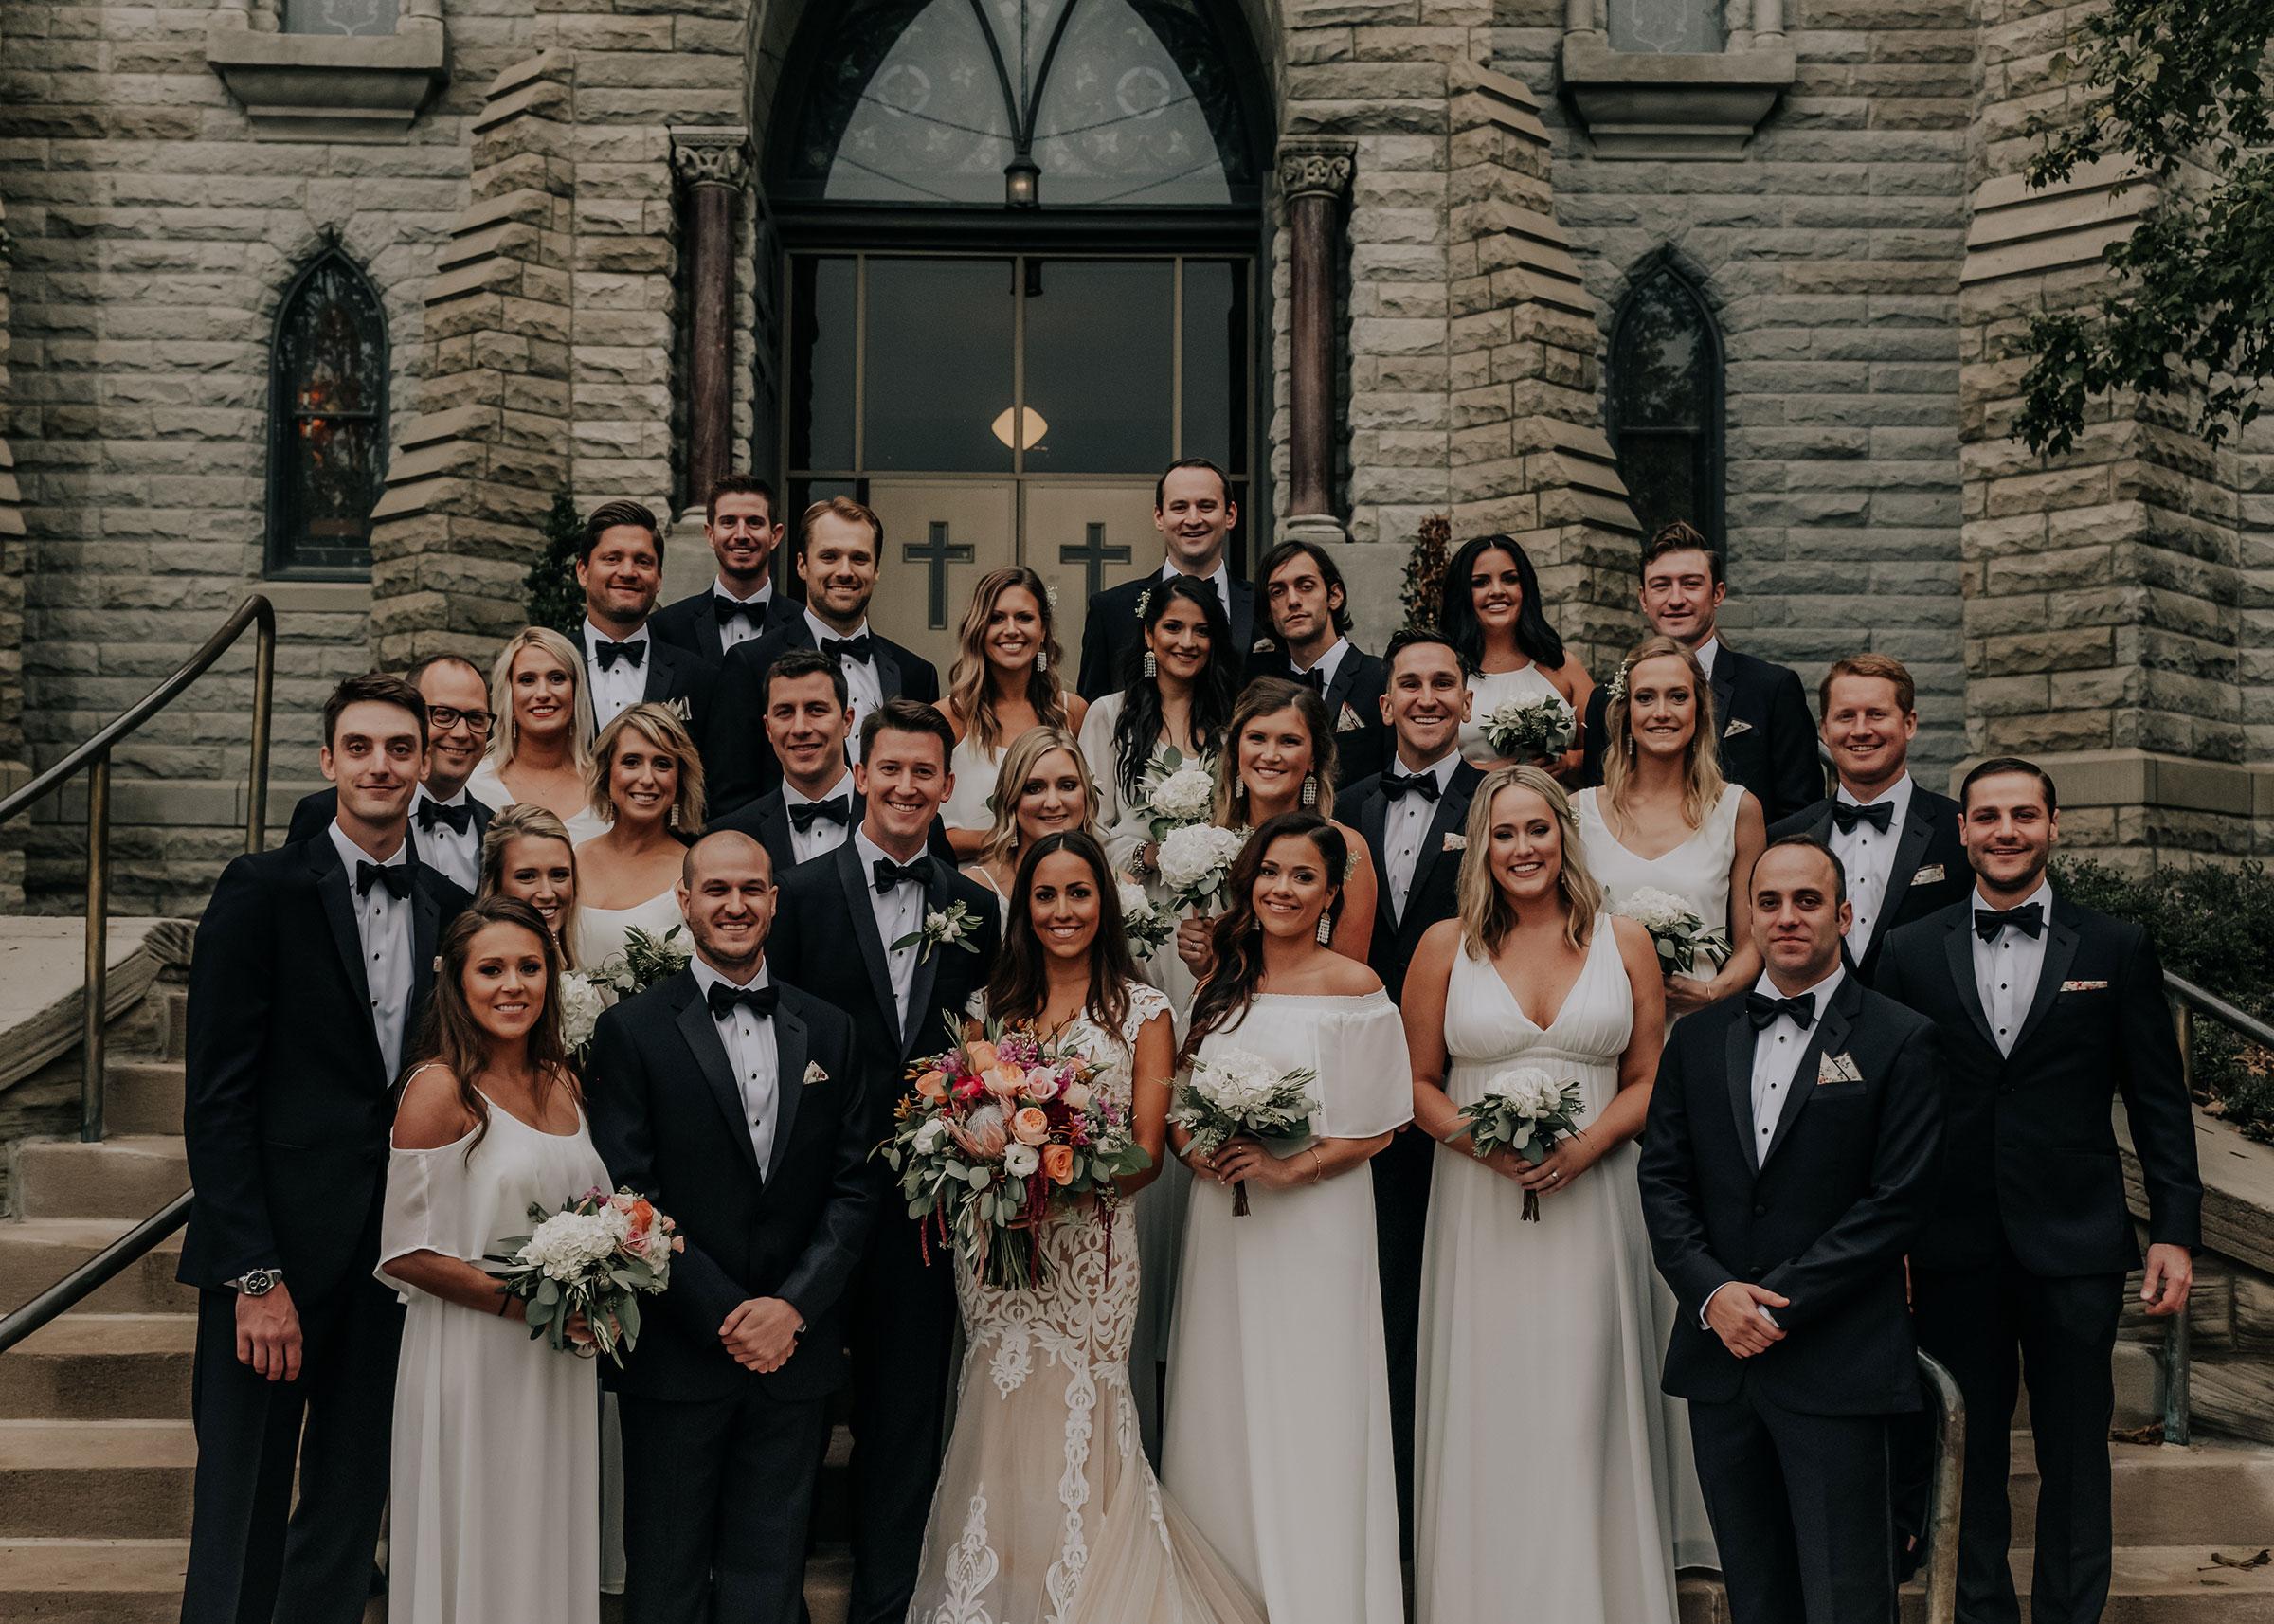 whole-wedding-party-posing-on-stairs-st-johns-church-at-creighton-omaha-nebraska-raelyn-ramey-photography.jpg